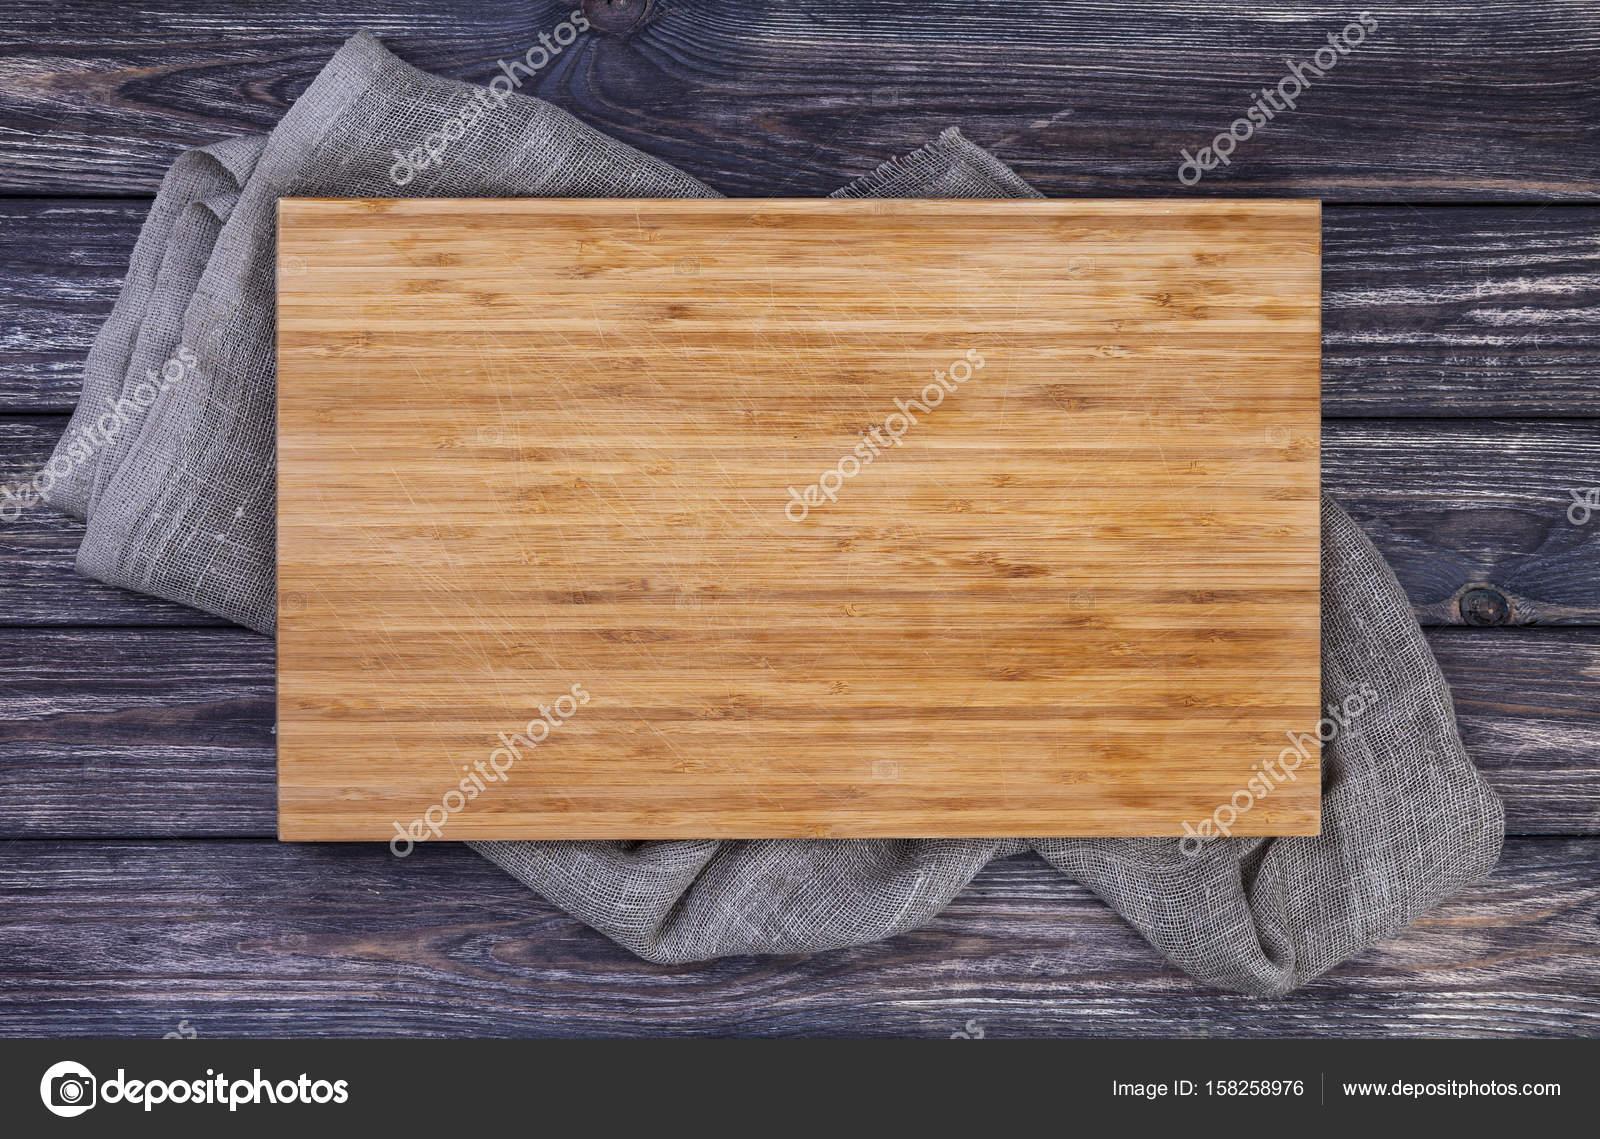 Lade serveren over oude houten tafel bord snijden op donkere